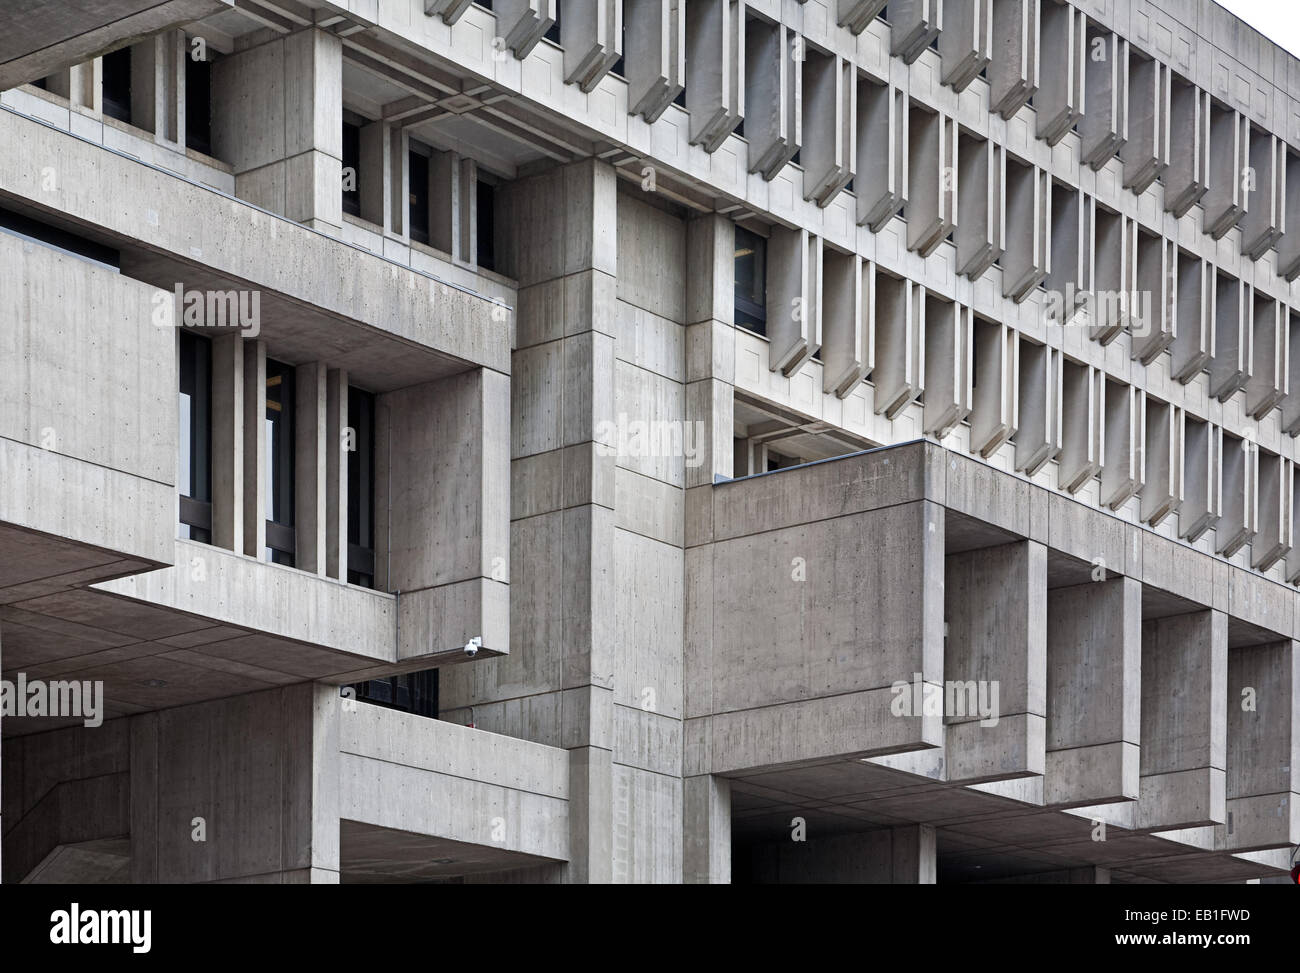 Detalle arquitectónico de hormigón en Boston City Hall Imagen De Stock